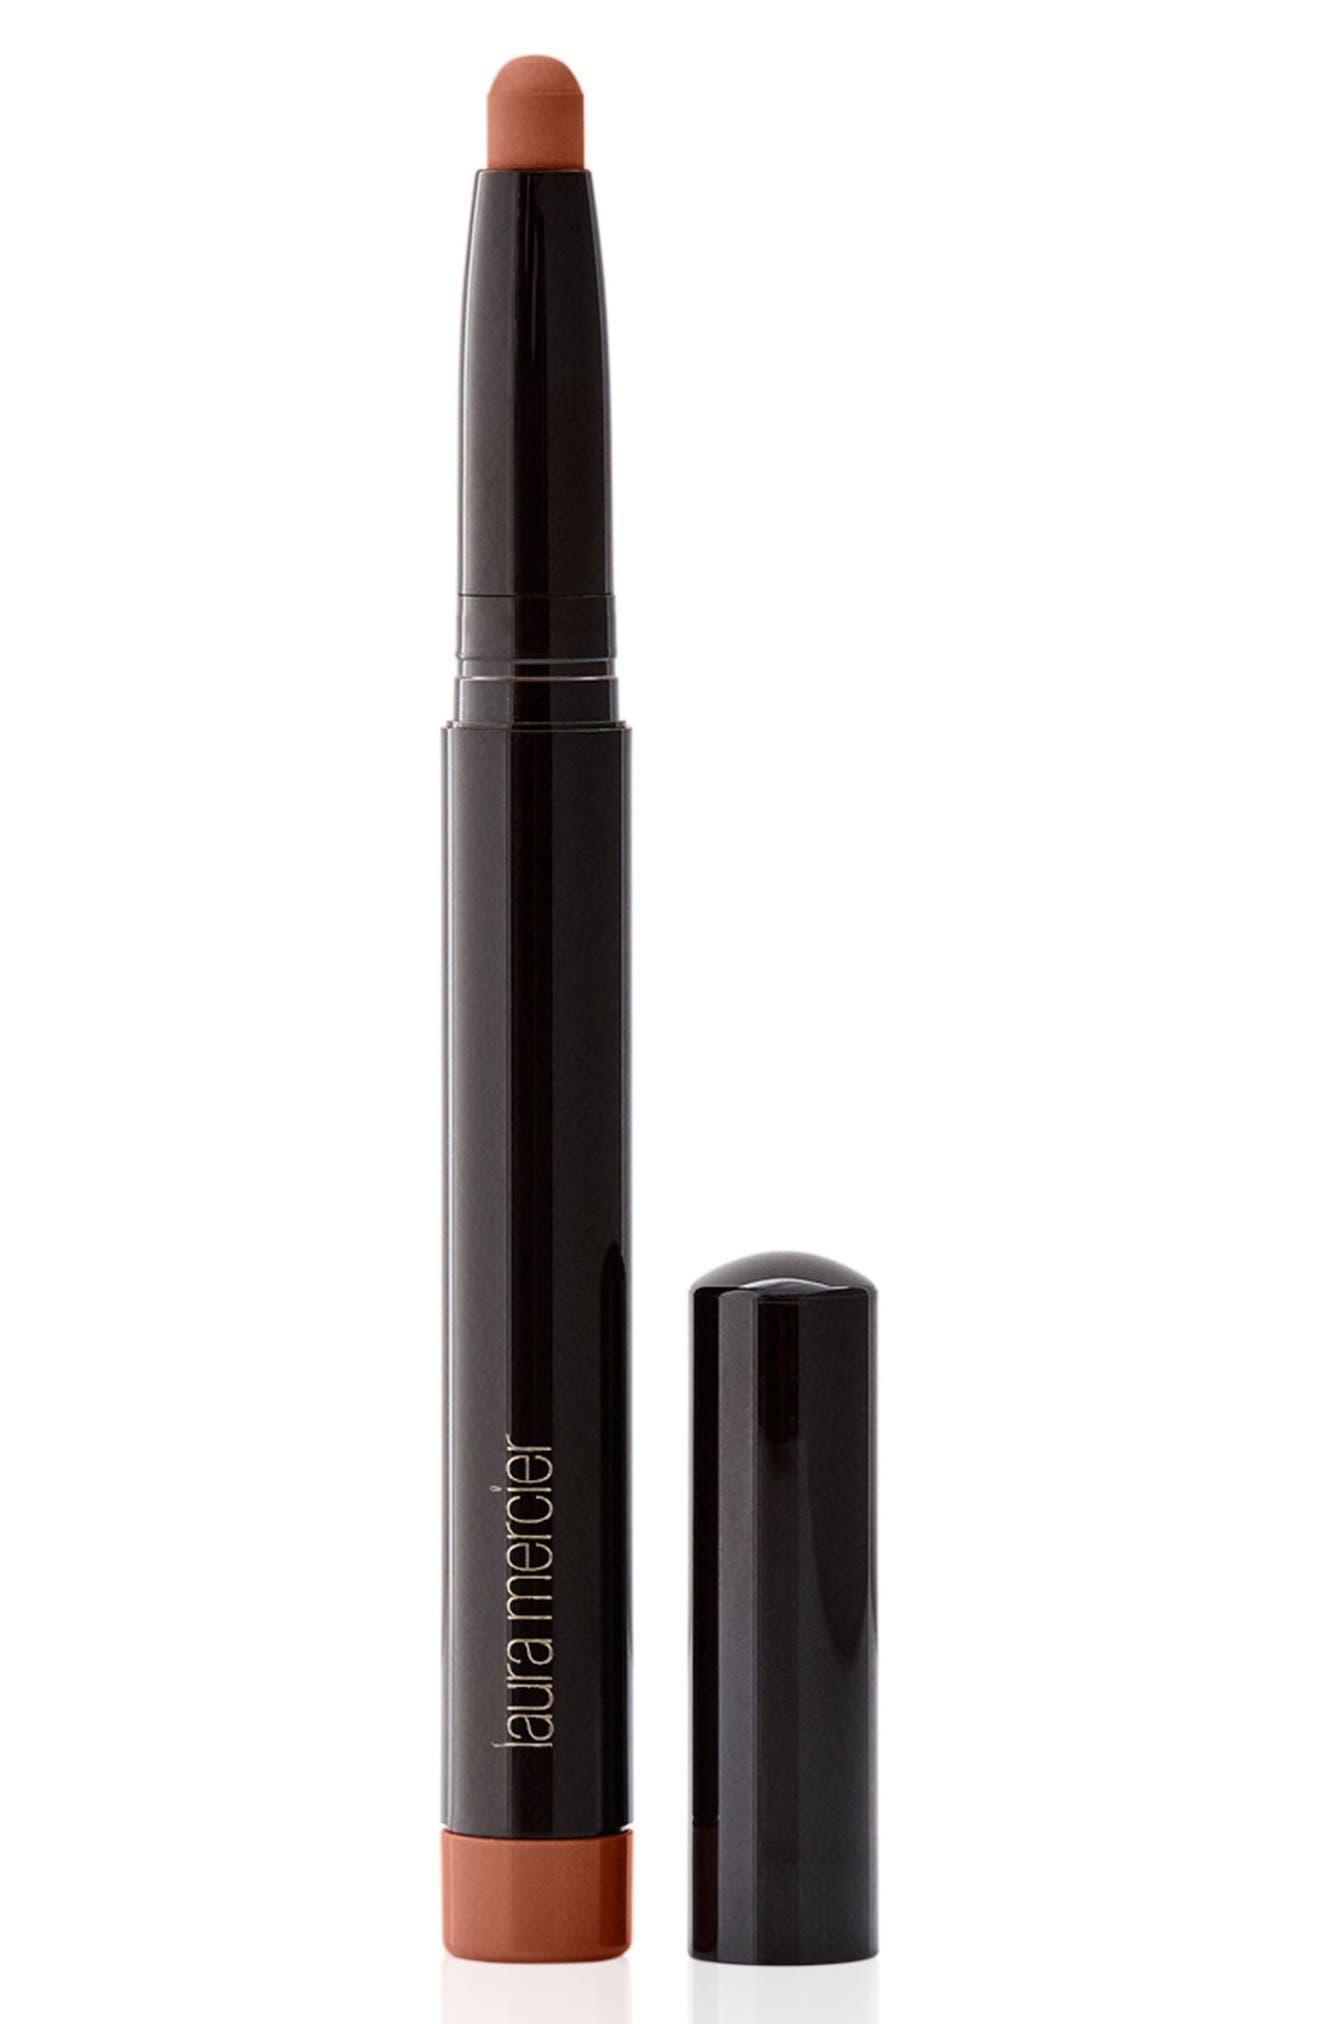 Velour Extreme Matte Lipstick | Nordstrom